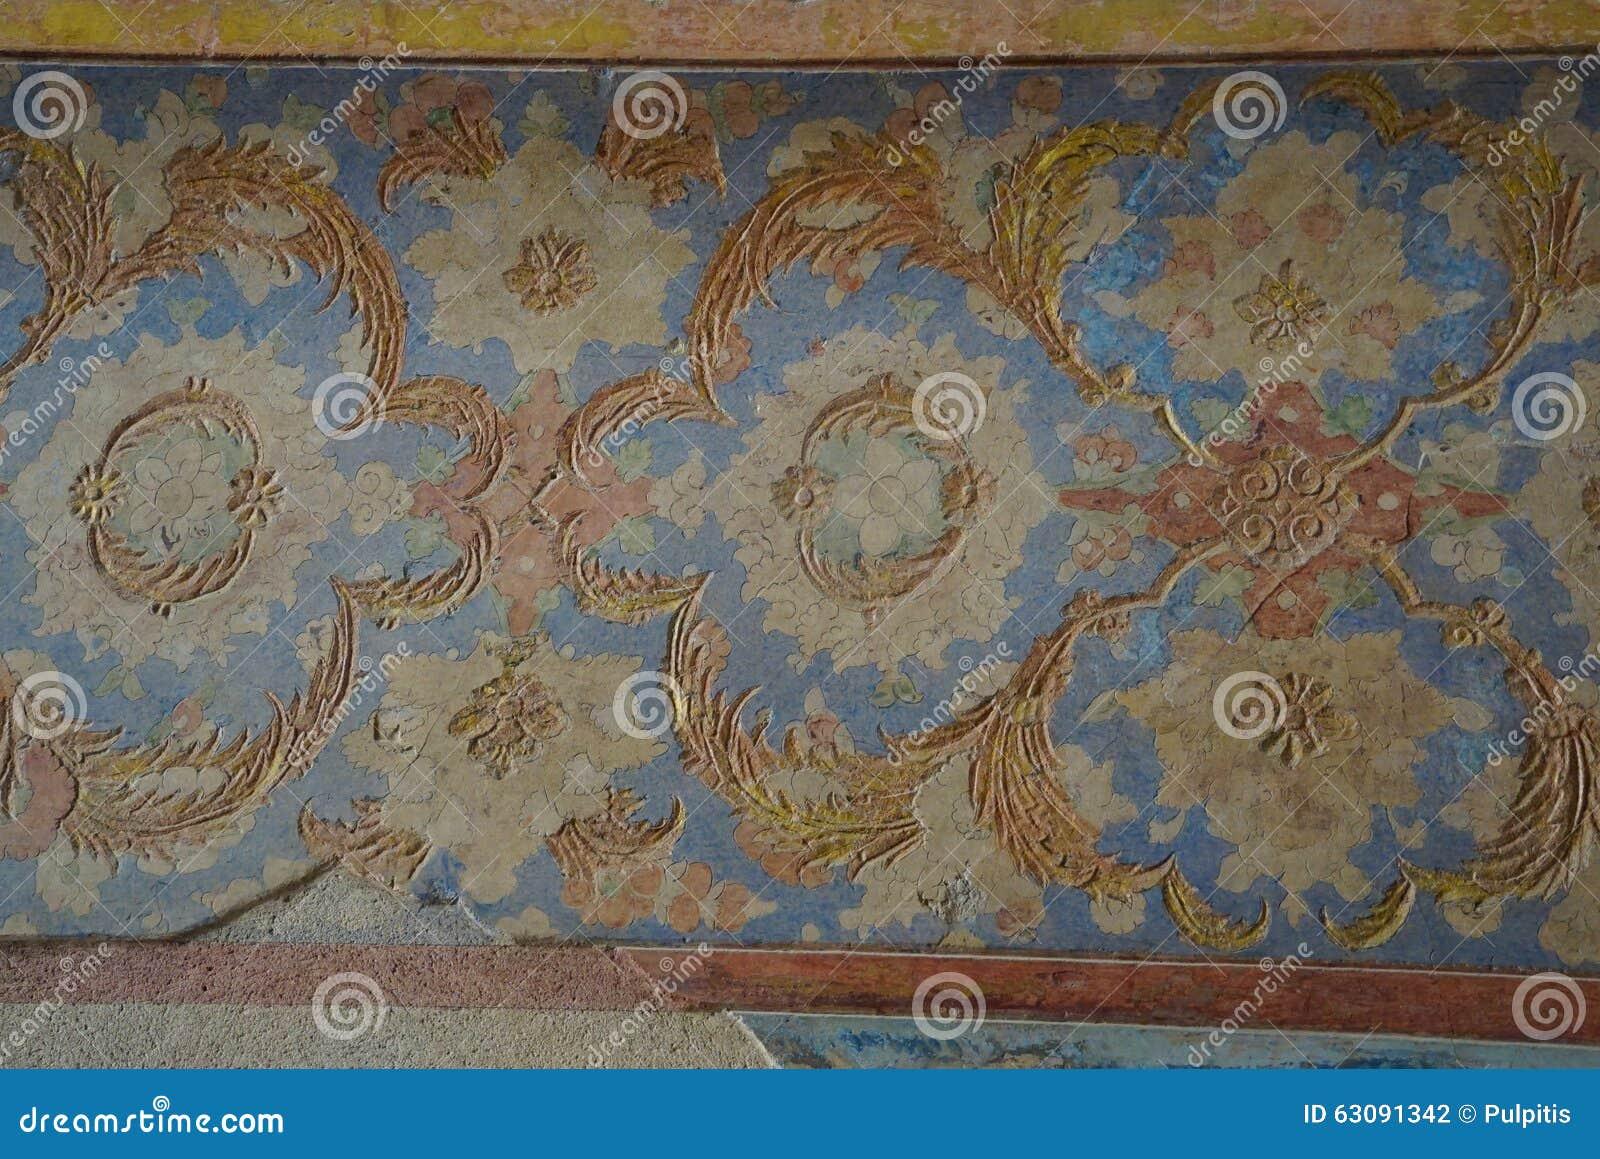 Download Beau Mur D'Ali Qapu Palace à Isphahan, Iran Photo stock - Image du historique, fleuri: 63091342